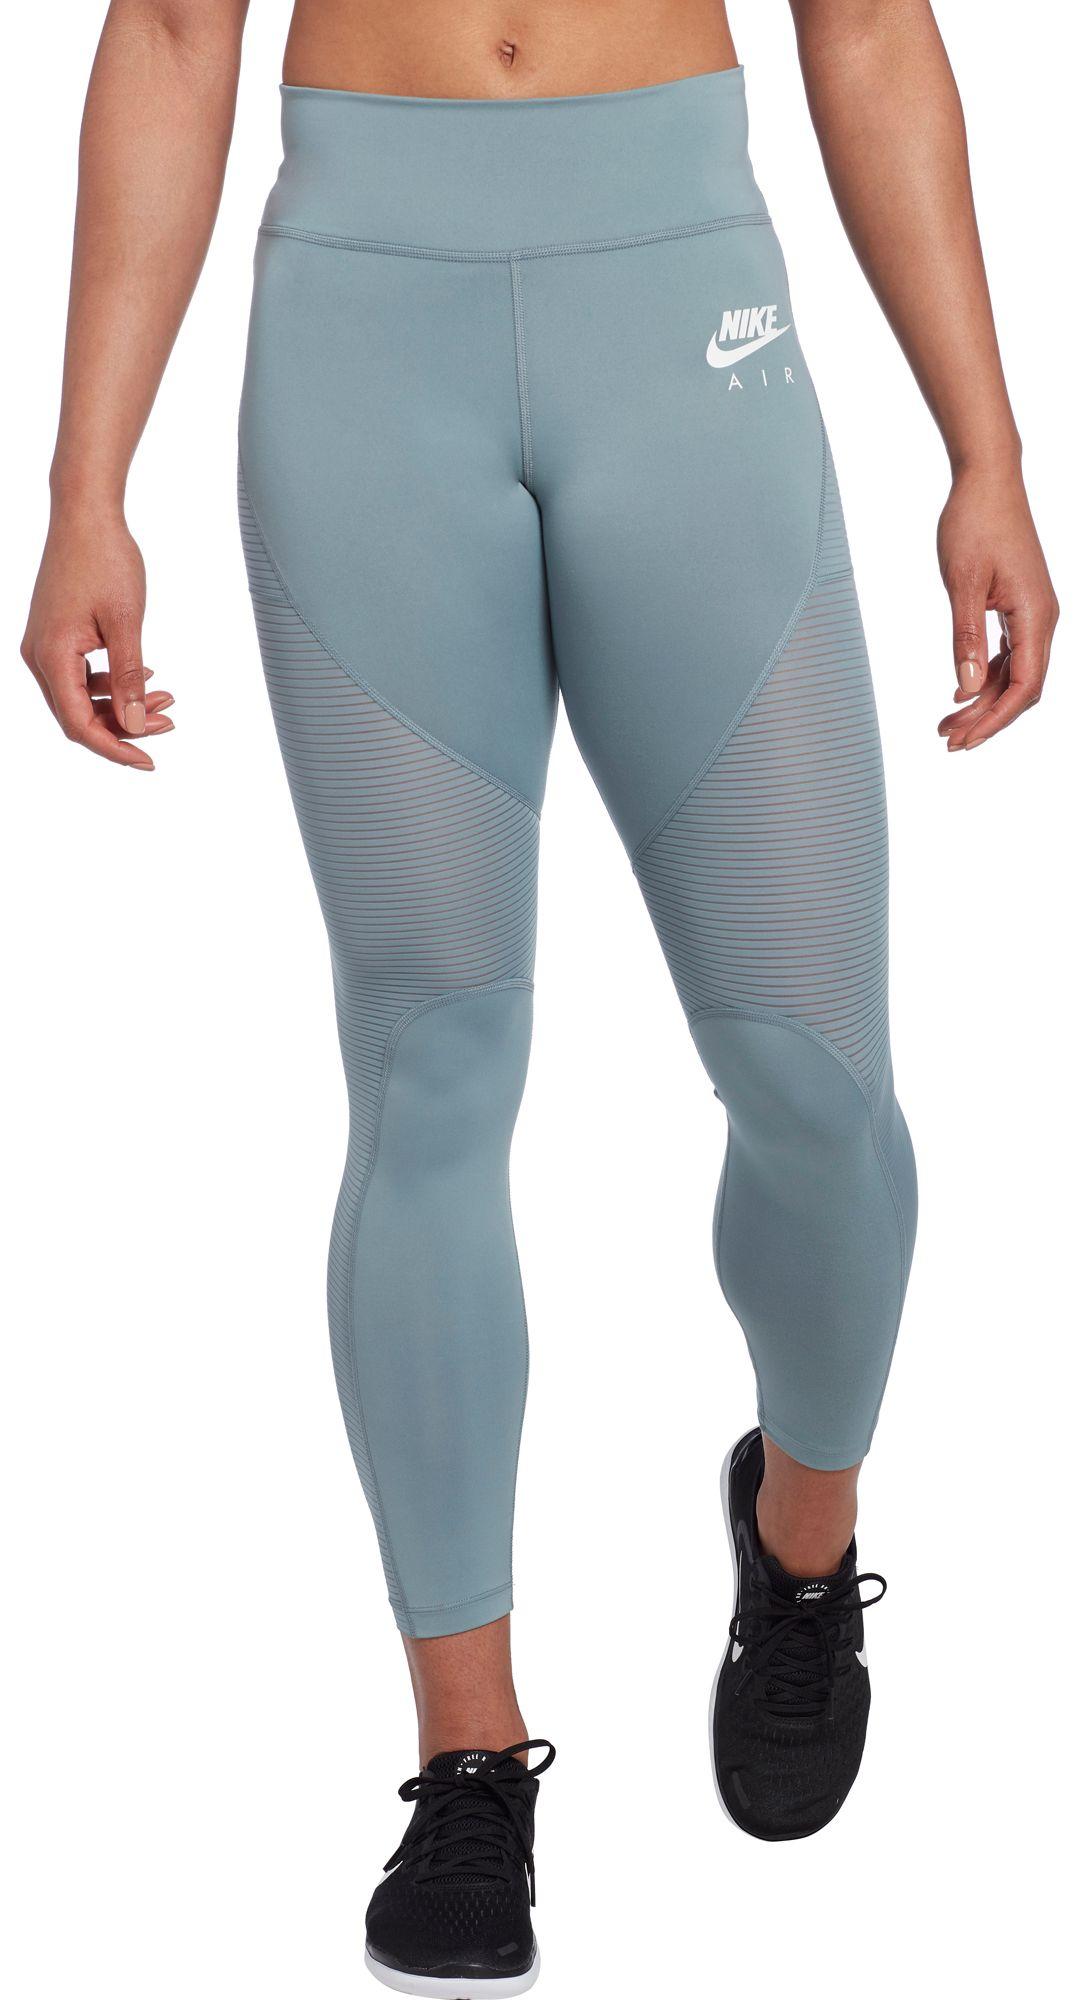 fc6b926dc7f44 Nike Air Women's Running 7/8 Tight | DICK'S Sporting Goods